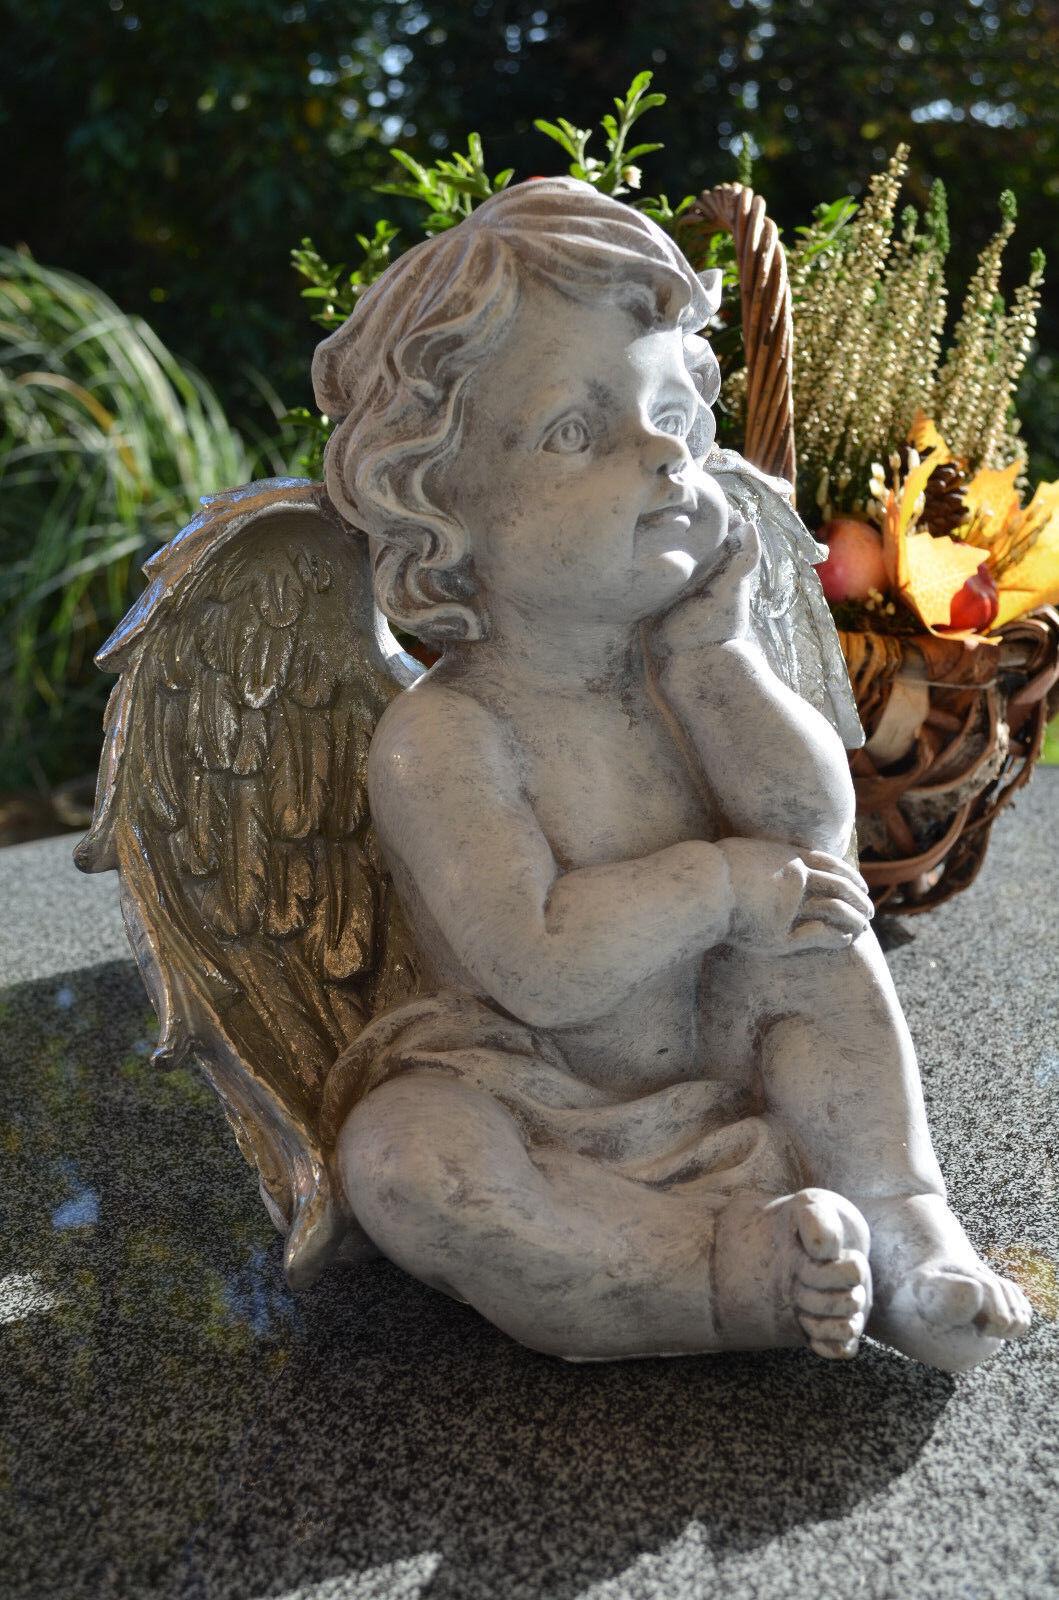 Tomba Angelo Angelo Angelo Custode lutto tomba gioielli decorazione angelo personaggio Bianco Grigio argentoo